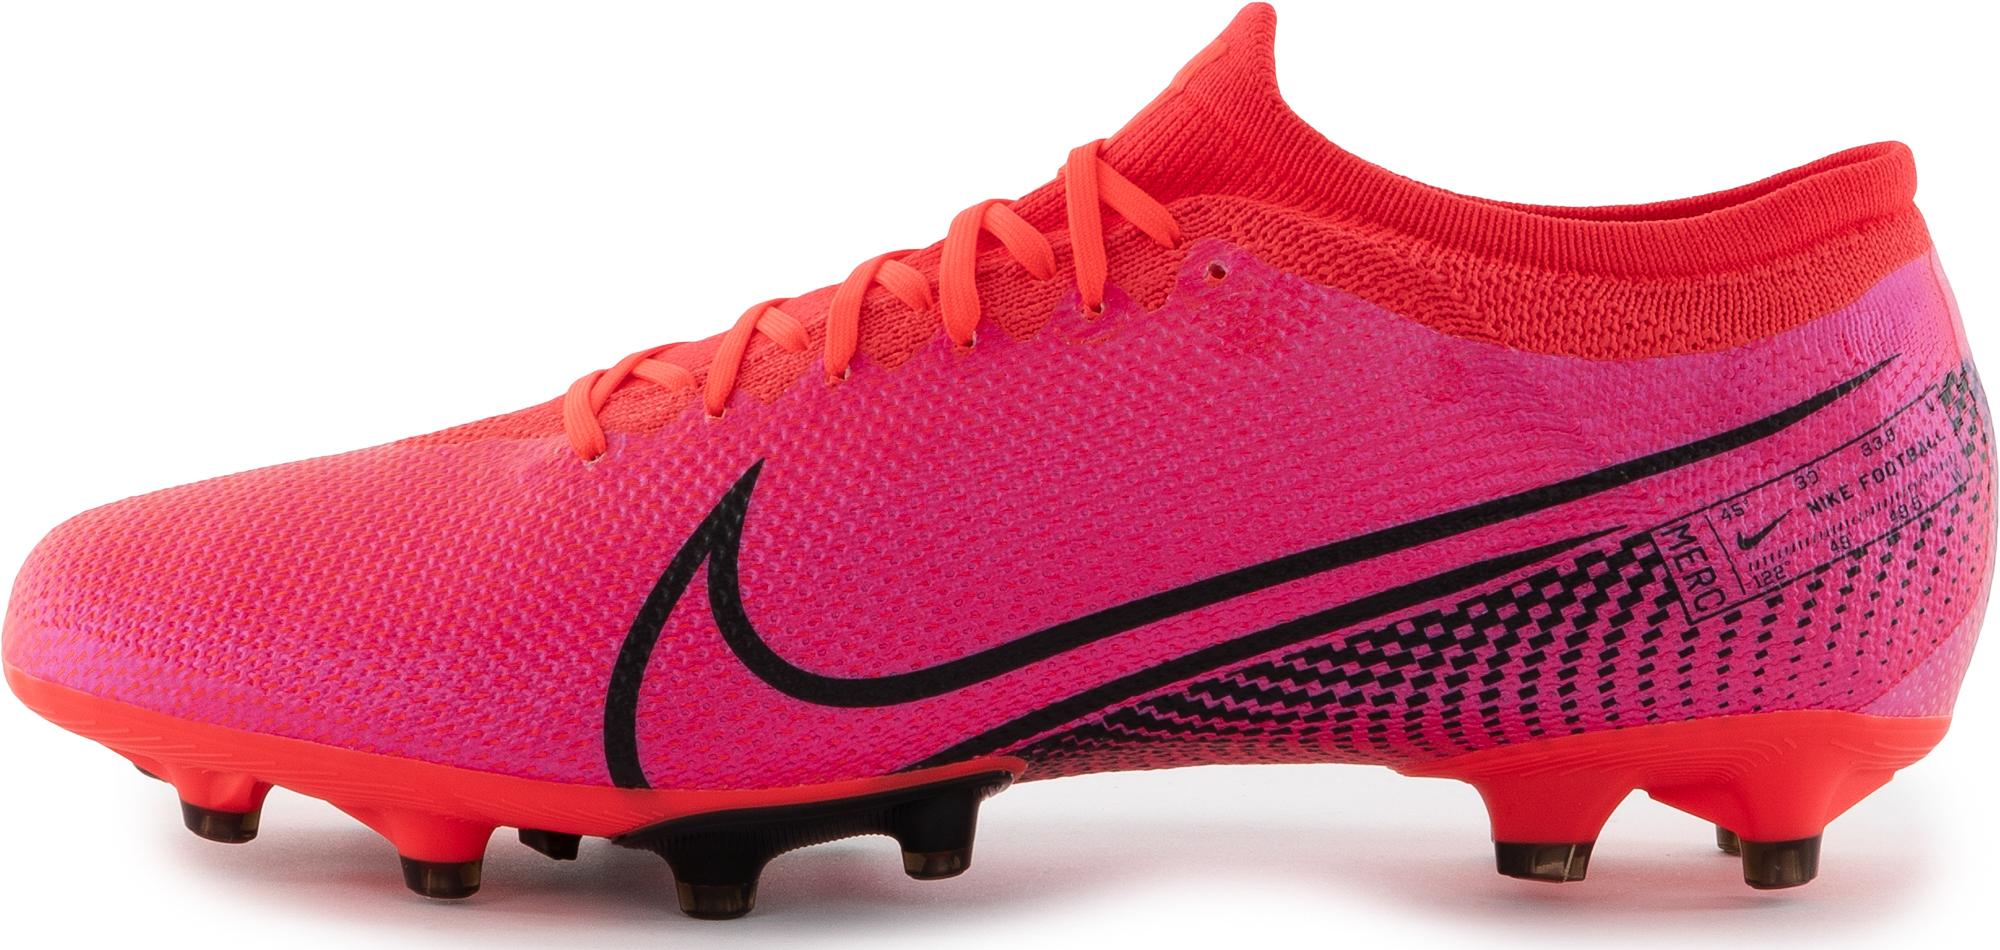 Nike Бутсы мужские Nike Mercurial Vapor 13 Pro AG-PRO, размер 43 цена